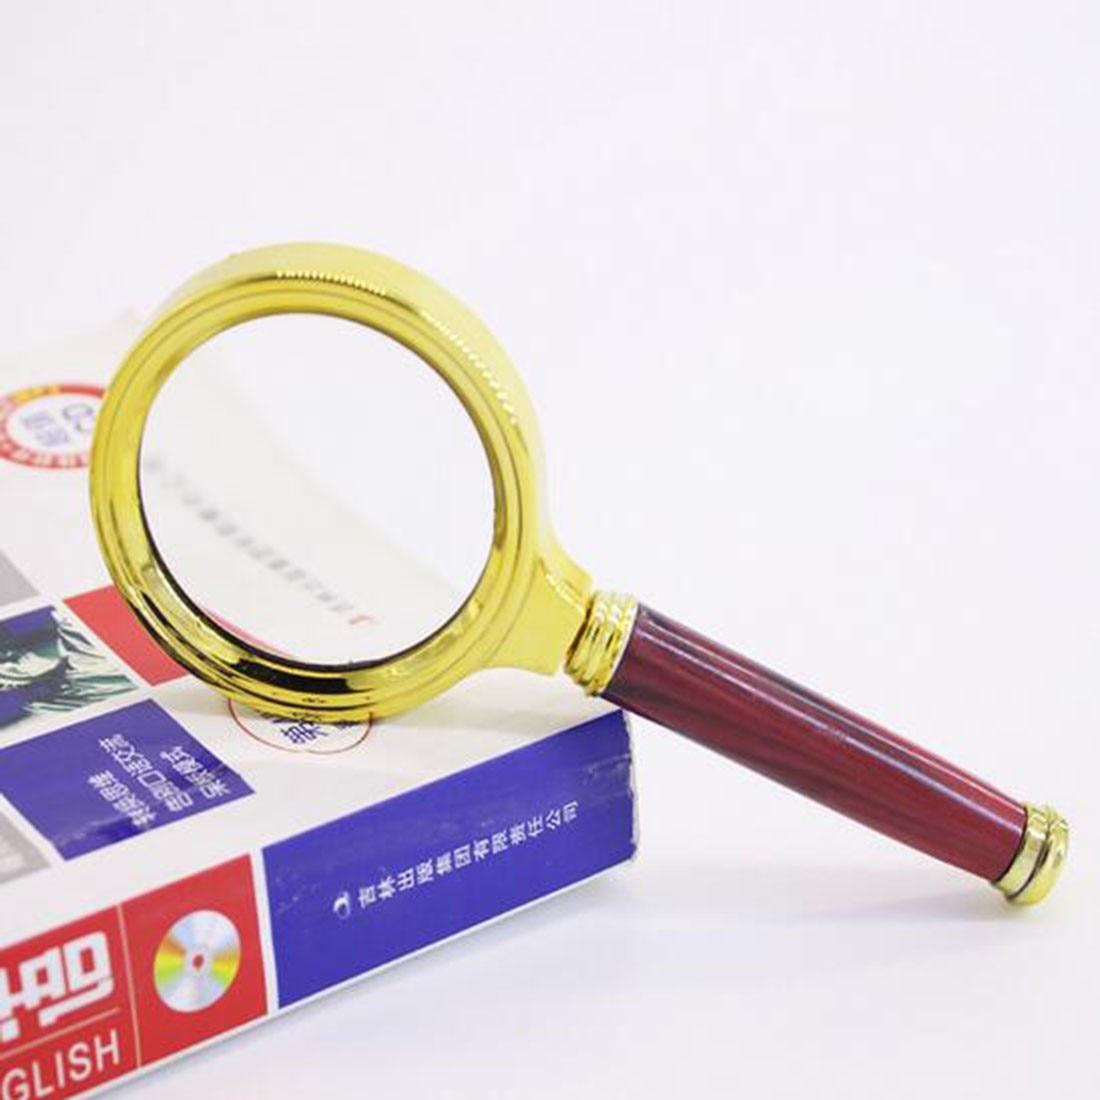 1pc 5 X 90mm Metal Handheld 10x Magnifier Magnifying Glass